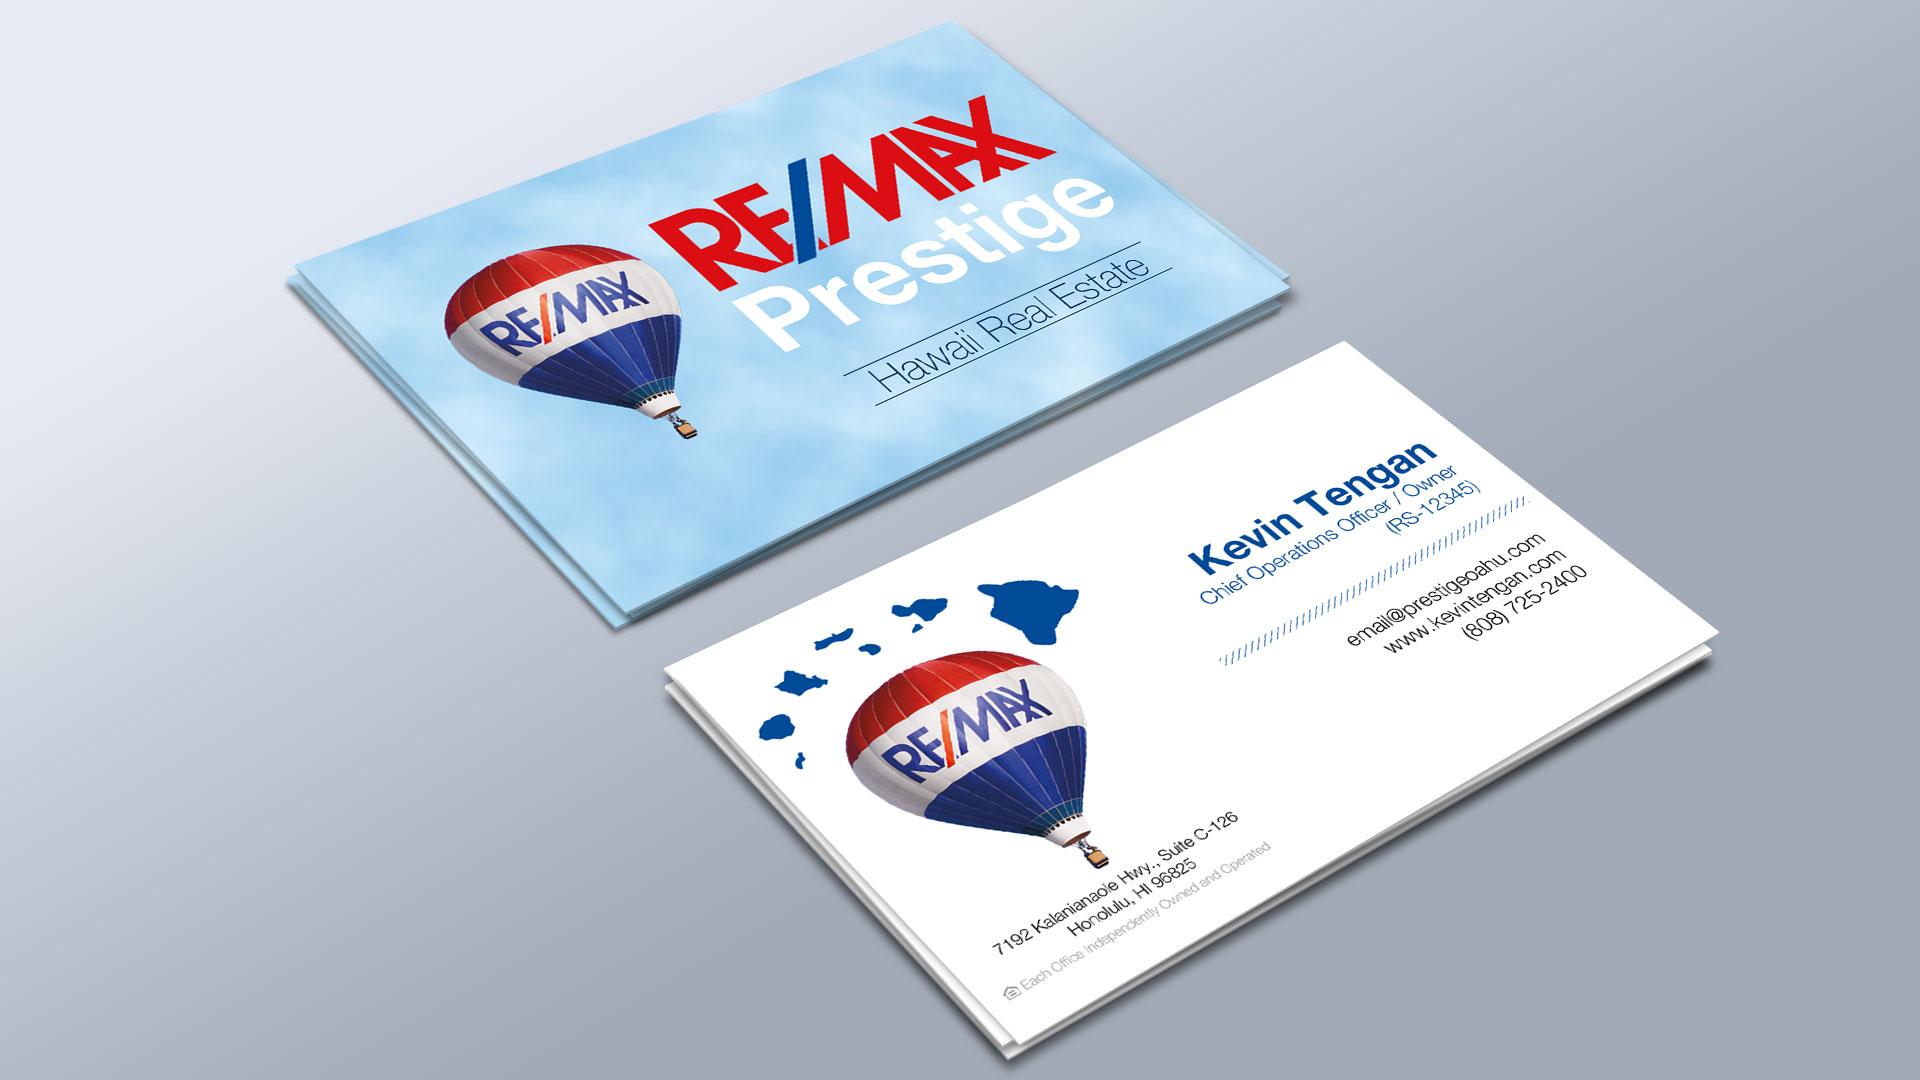 RE/MAX Prestige Business Cards |